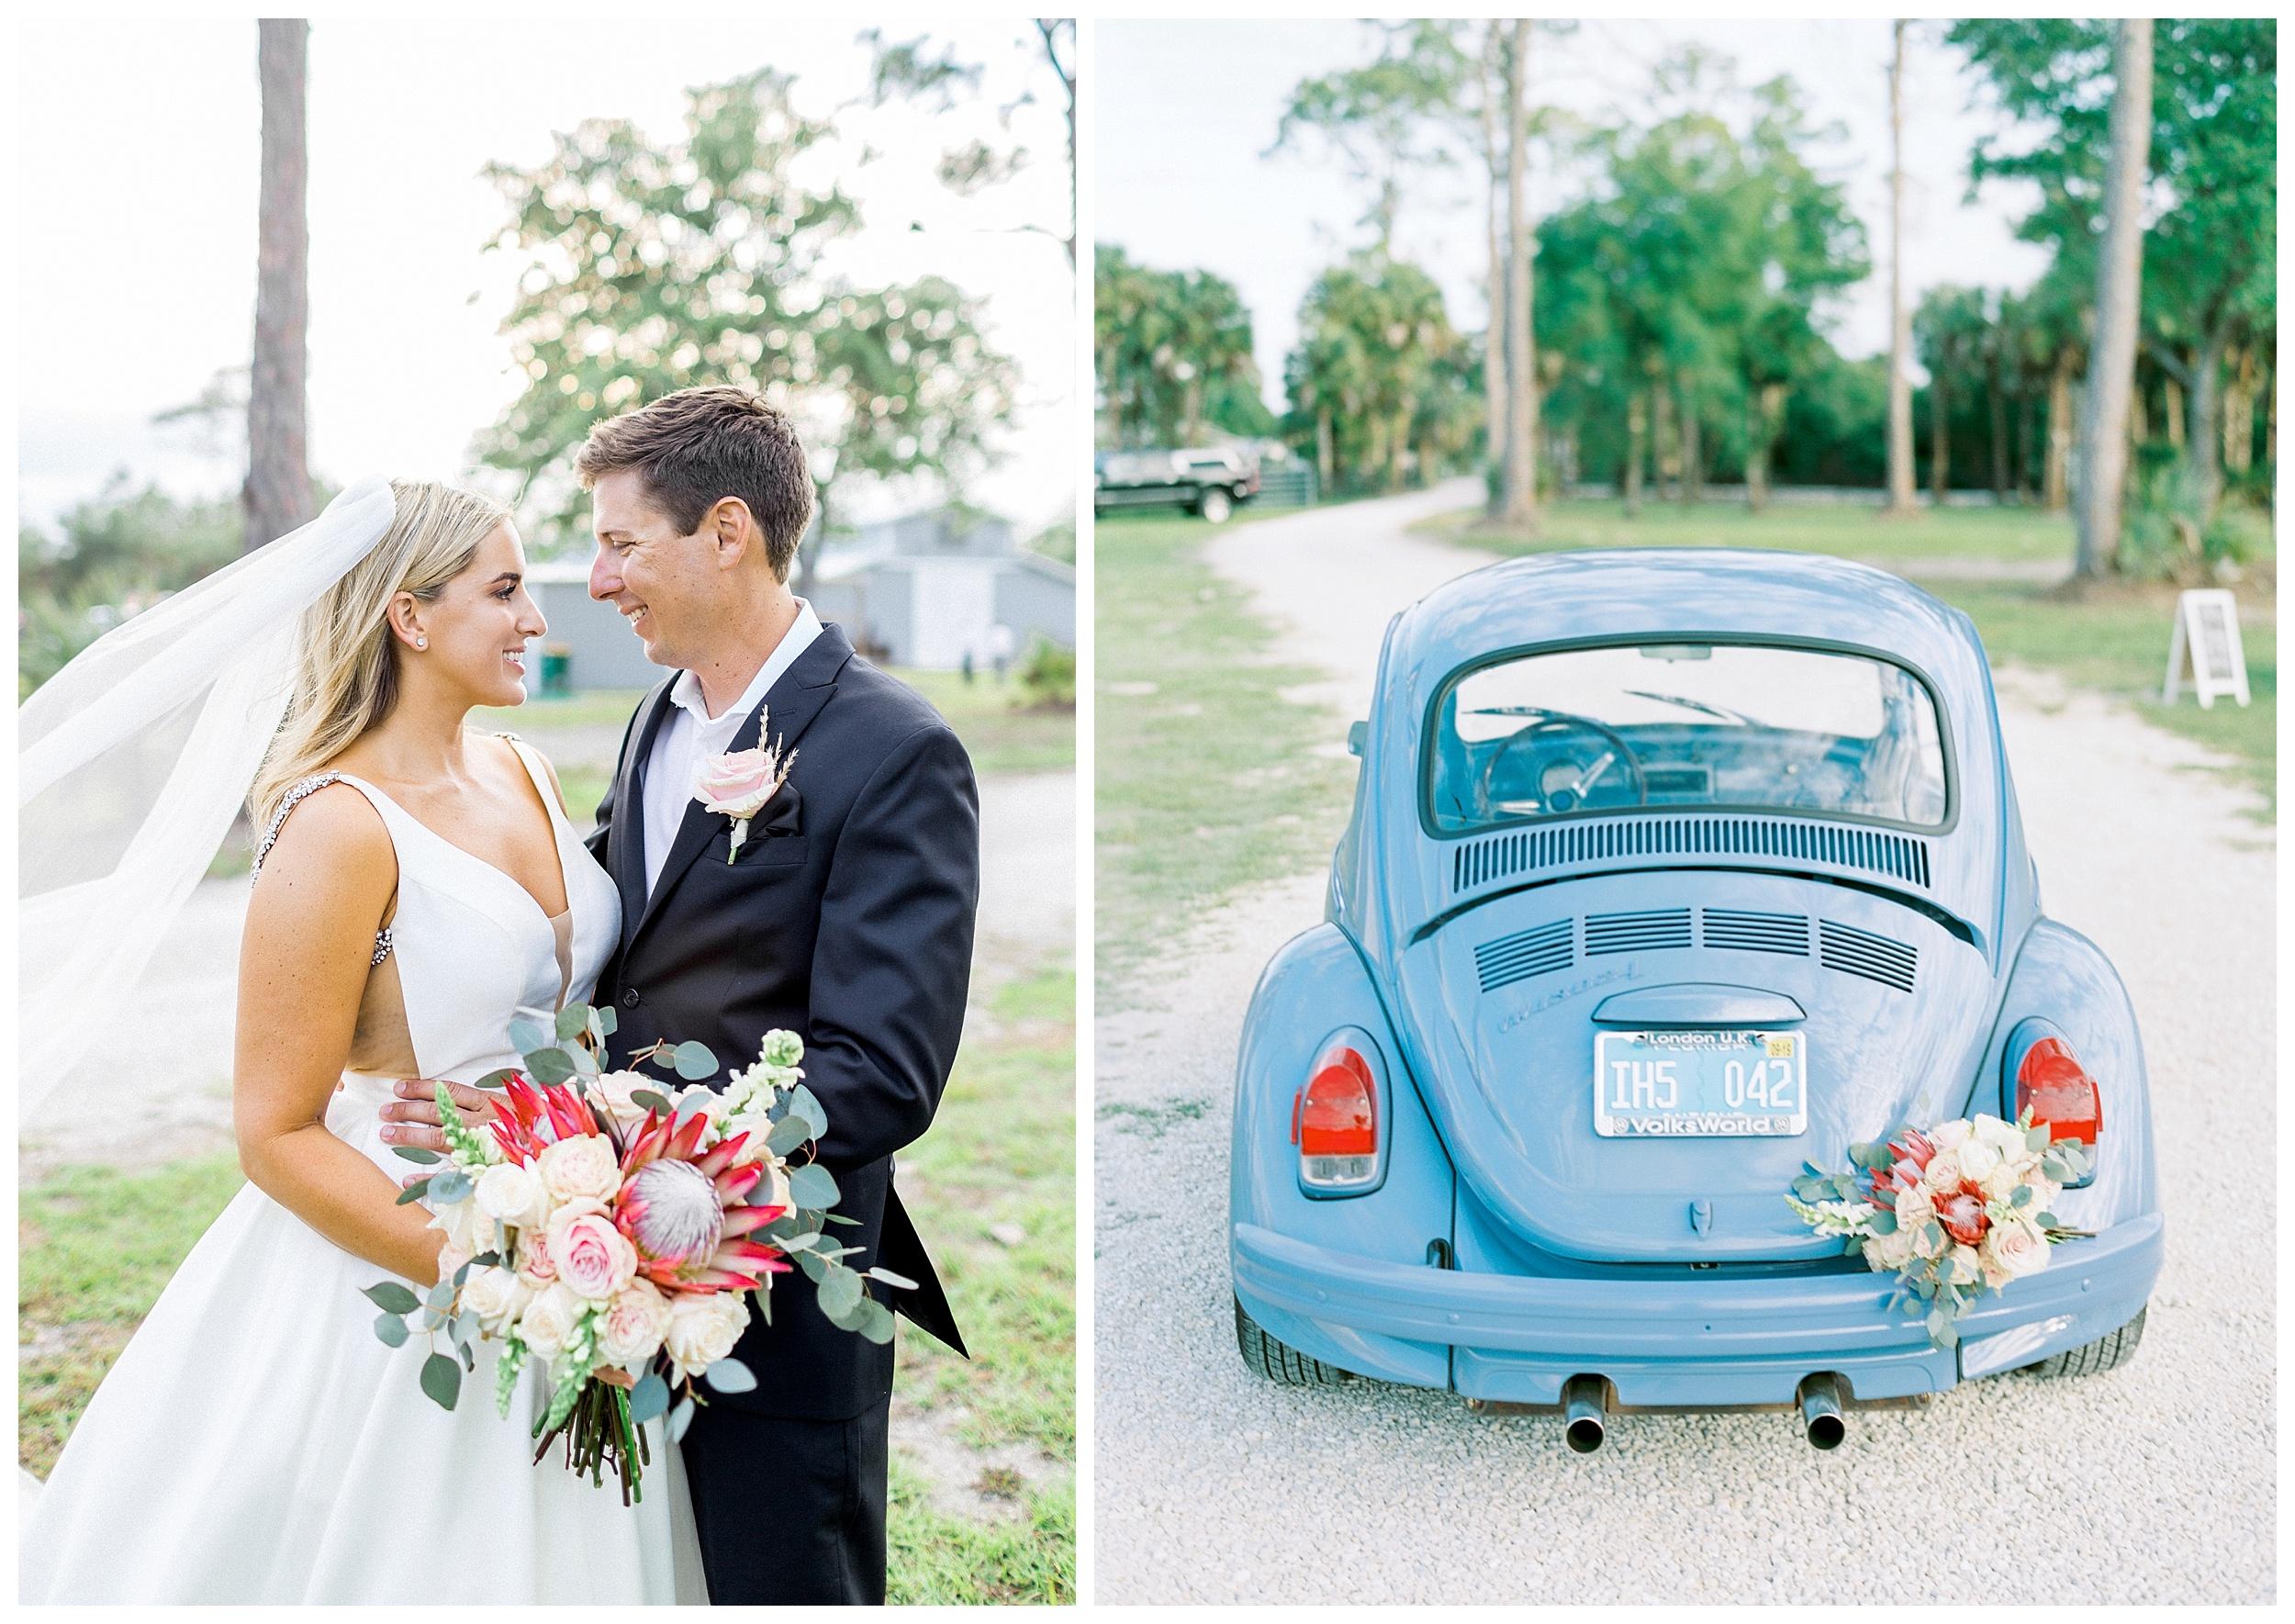 South Florida Wedding Photographer Kir Tuben_0089.jpg